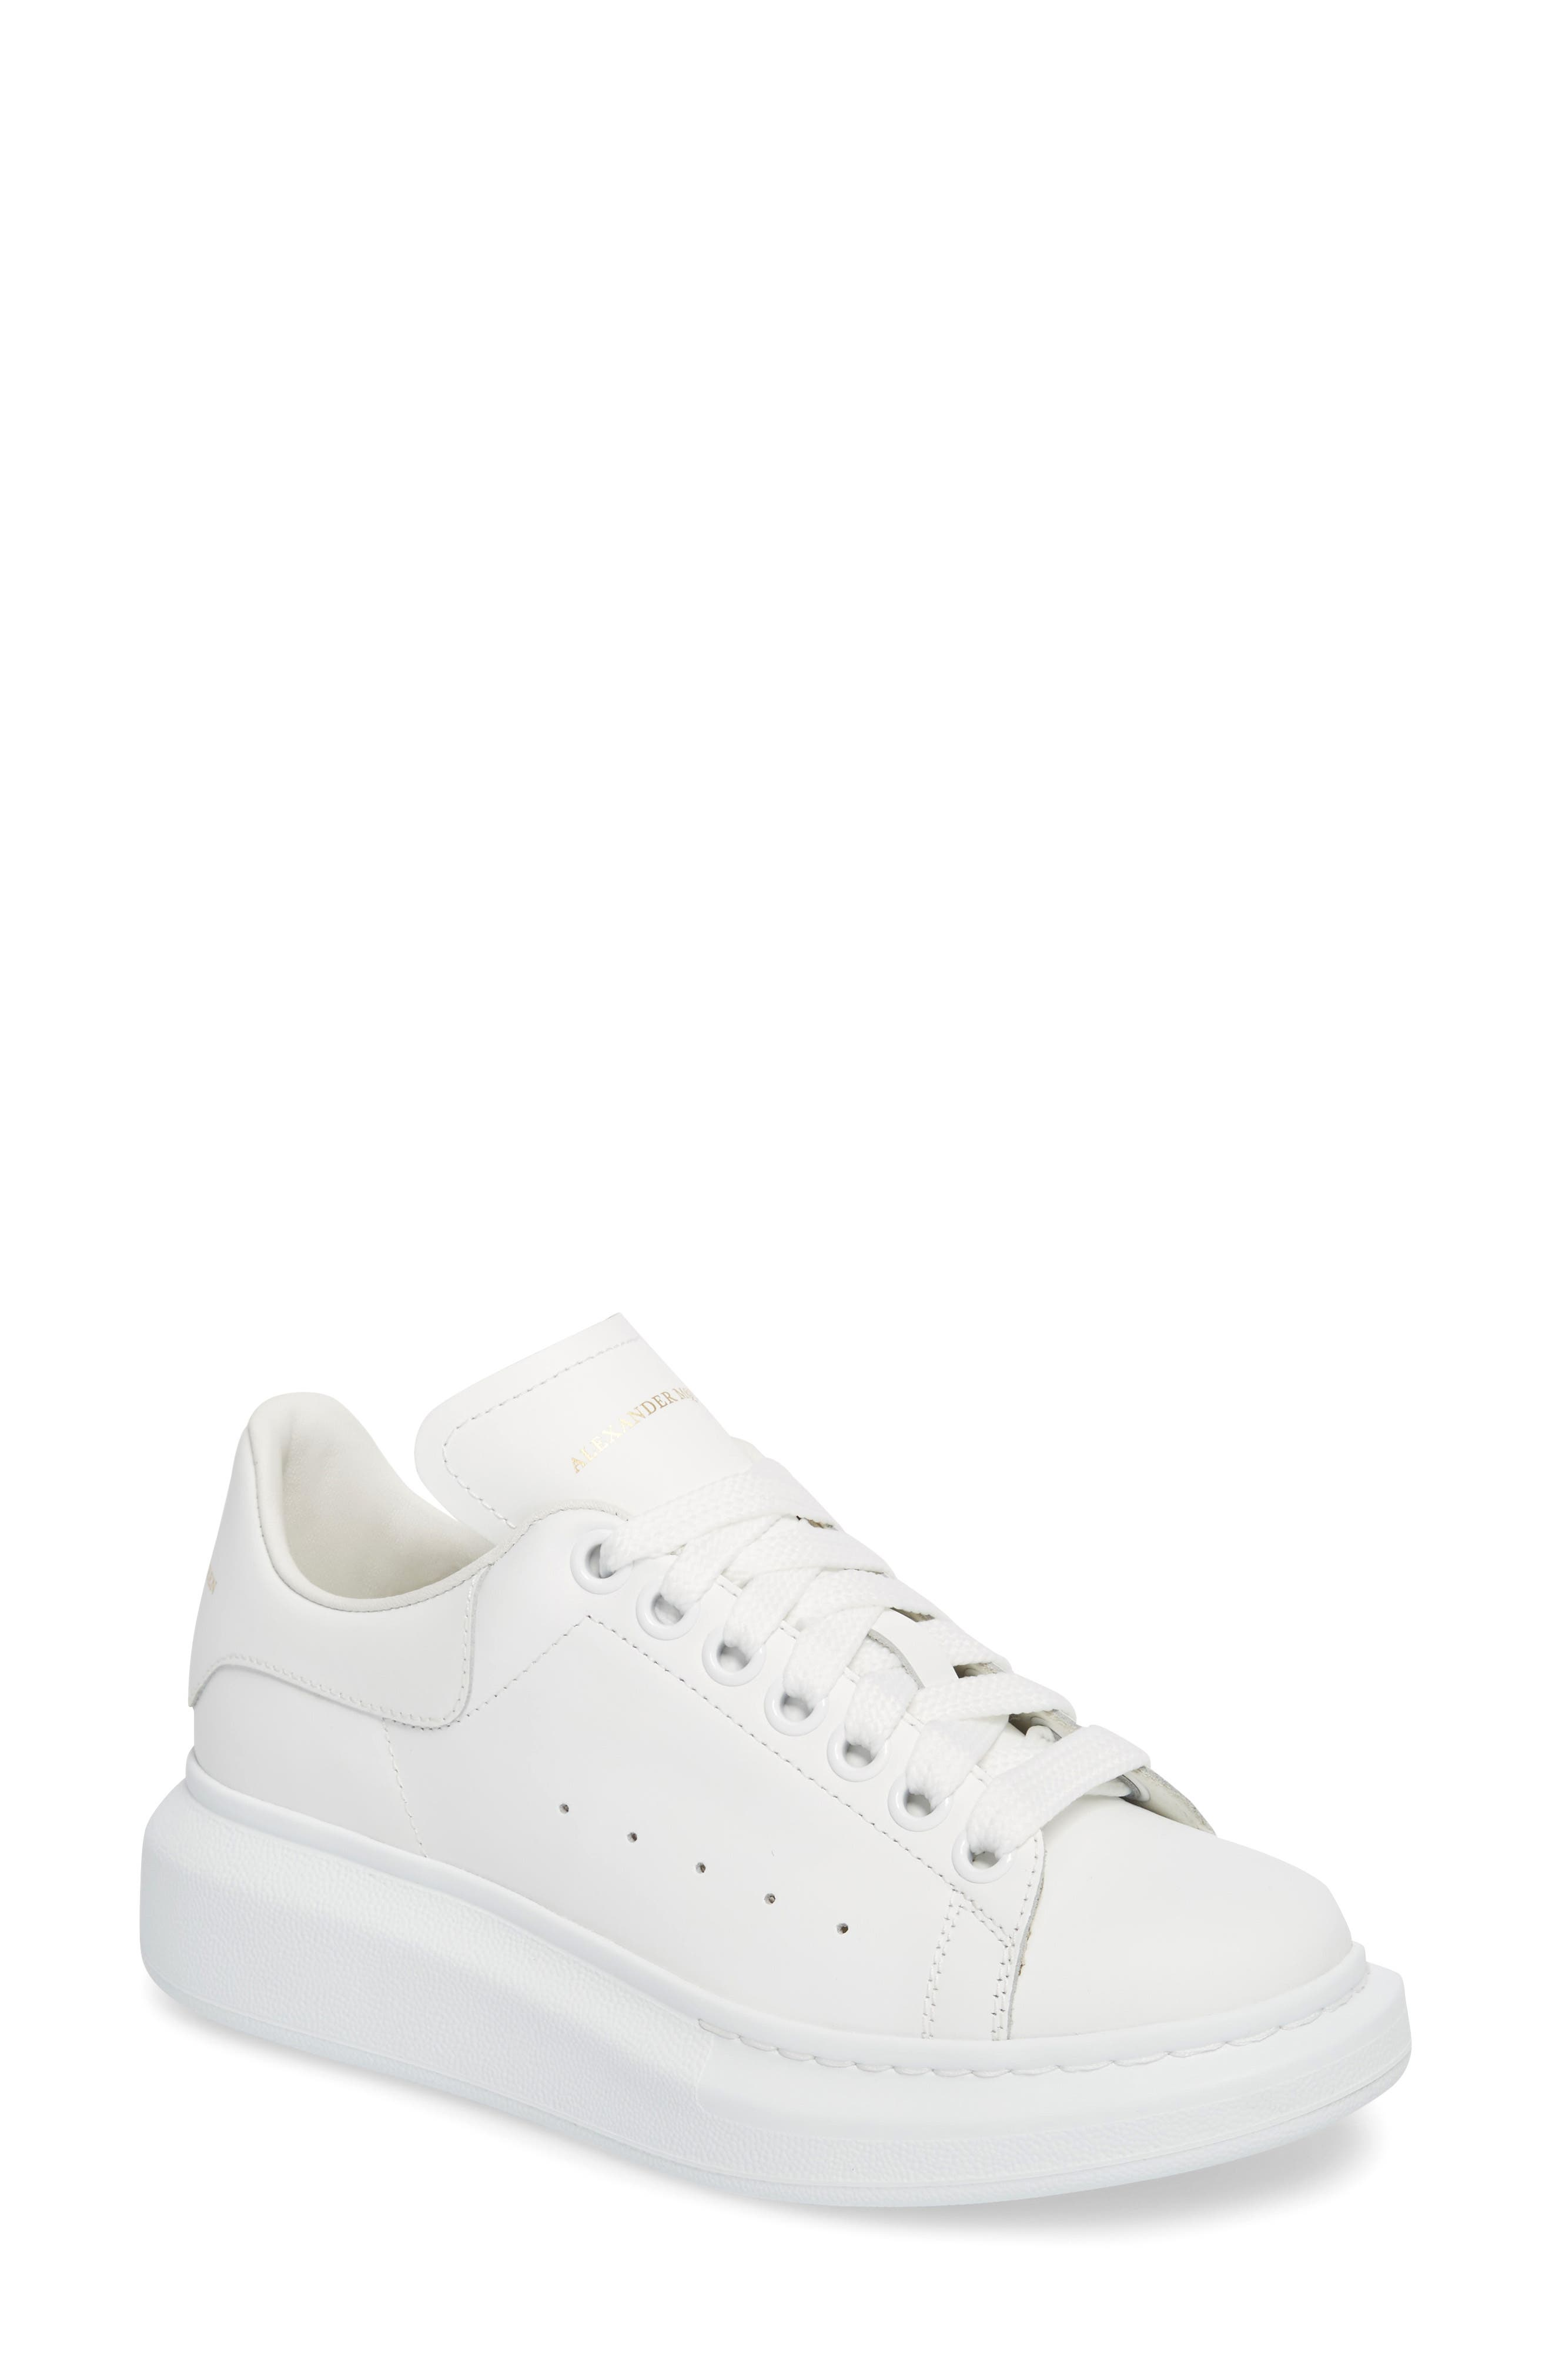 ALEXANDER MCQUEEN,                             Sneaker,                             Main thumbnail 1, color,                             WHITE/ WHITE